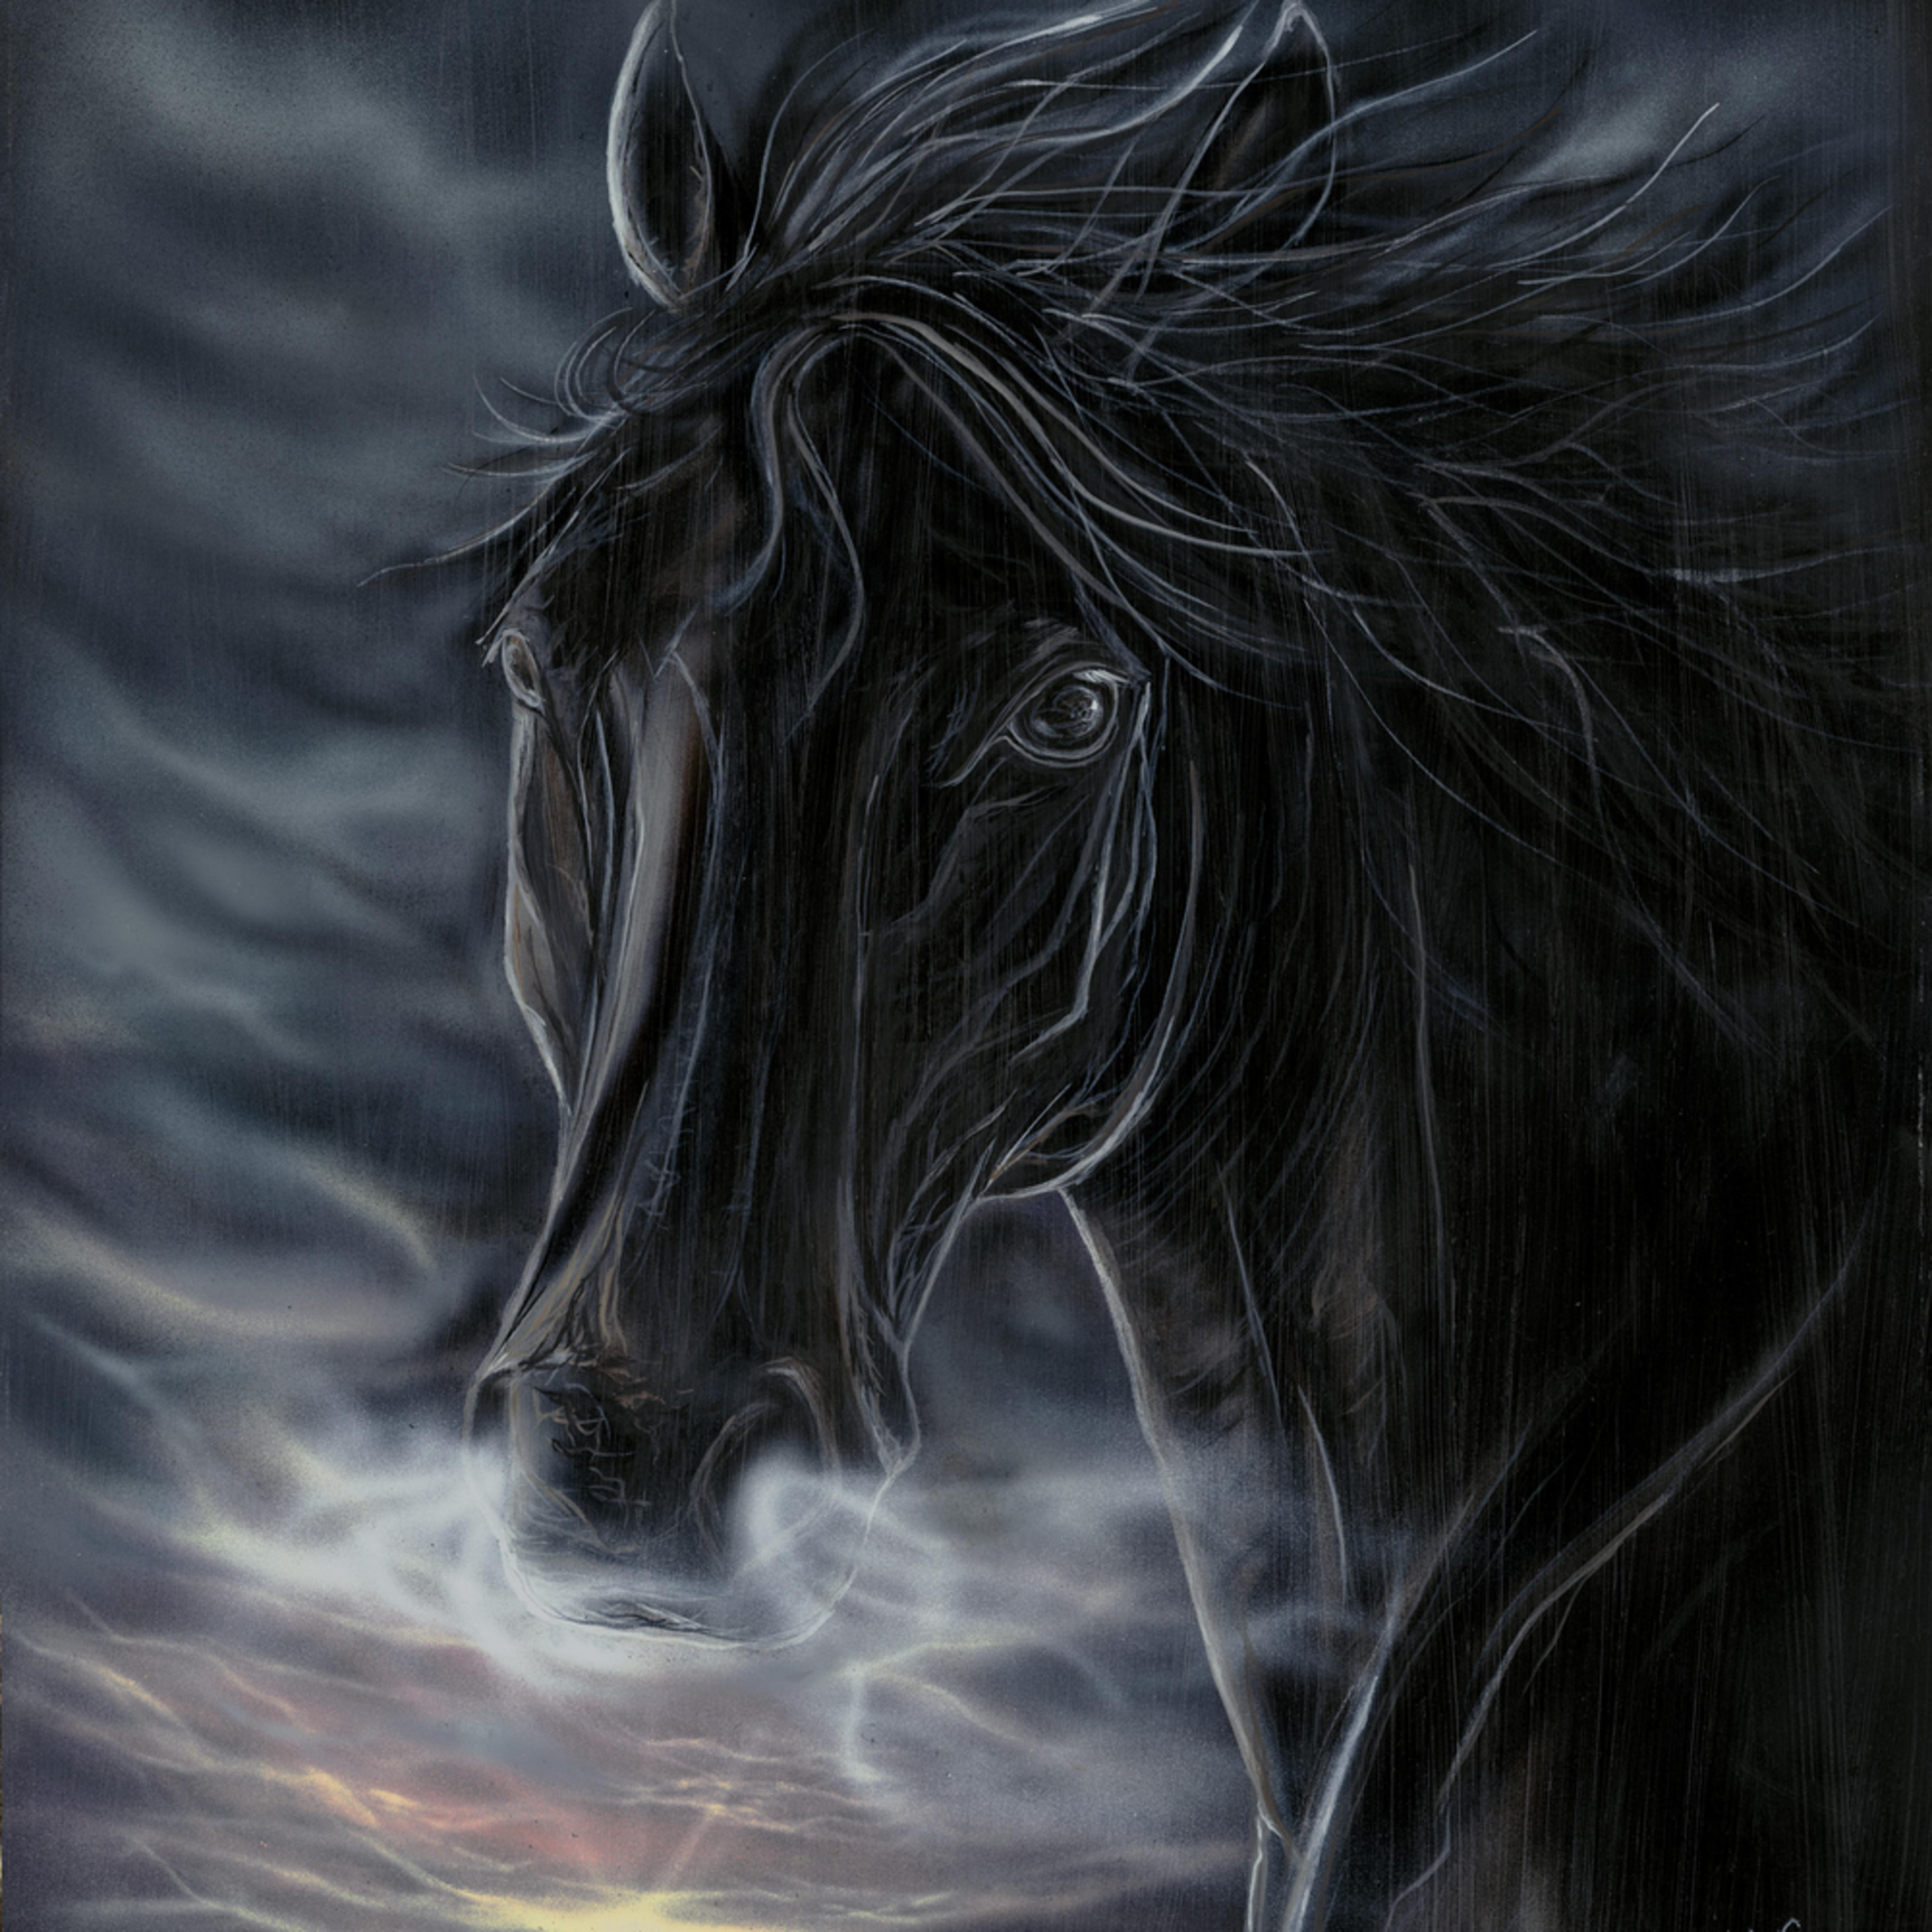 Black night j2ecrq